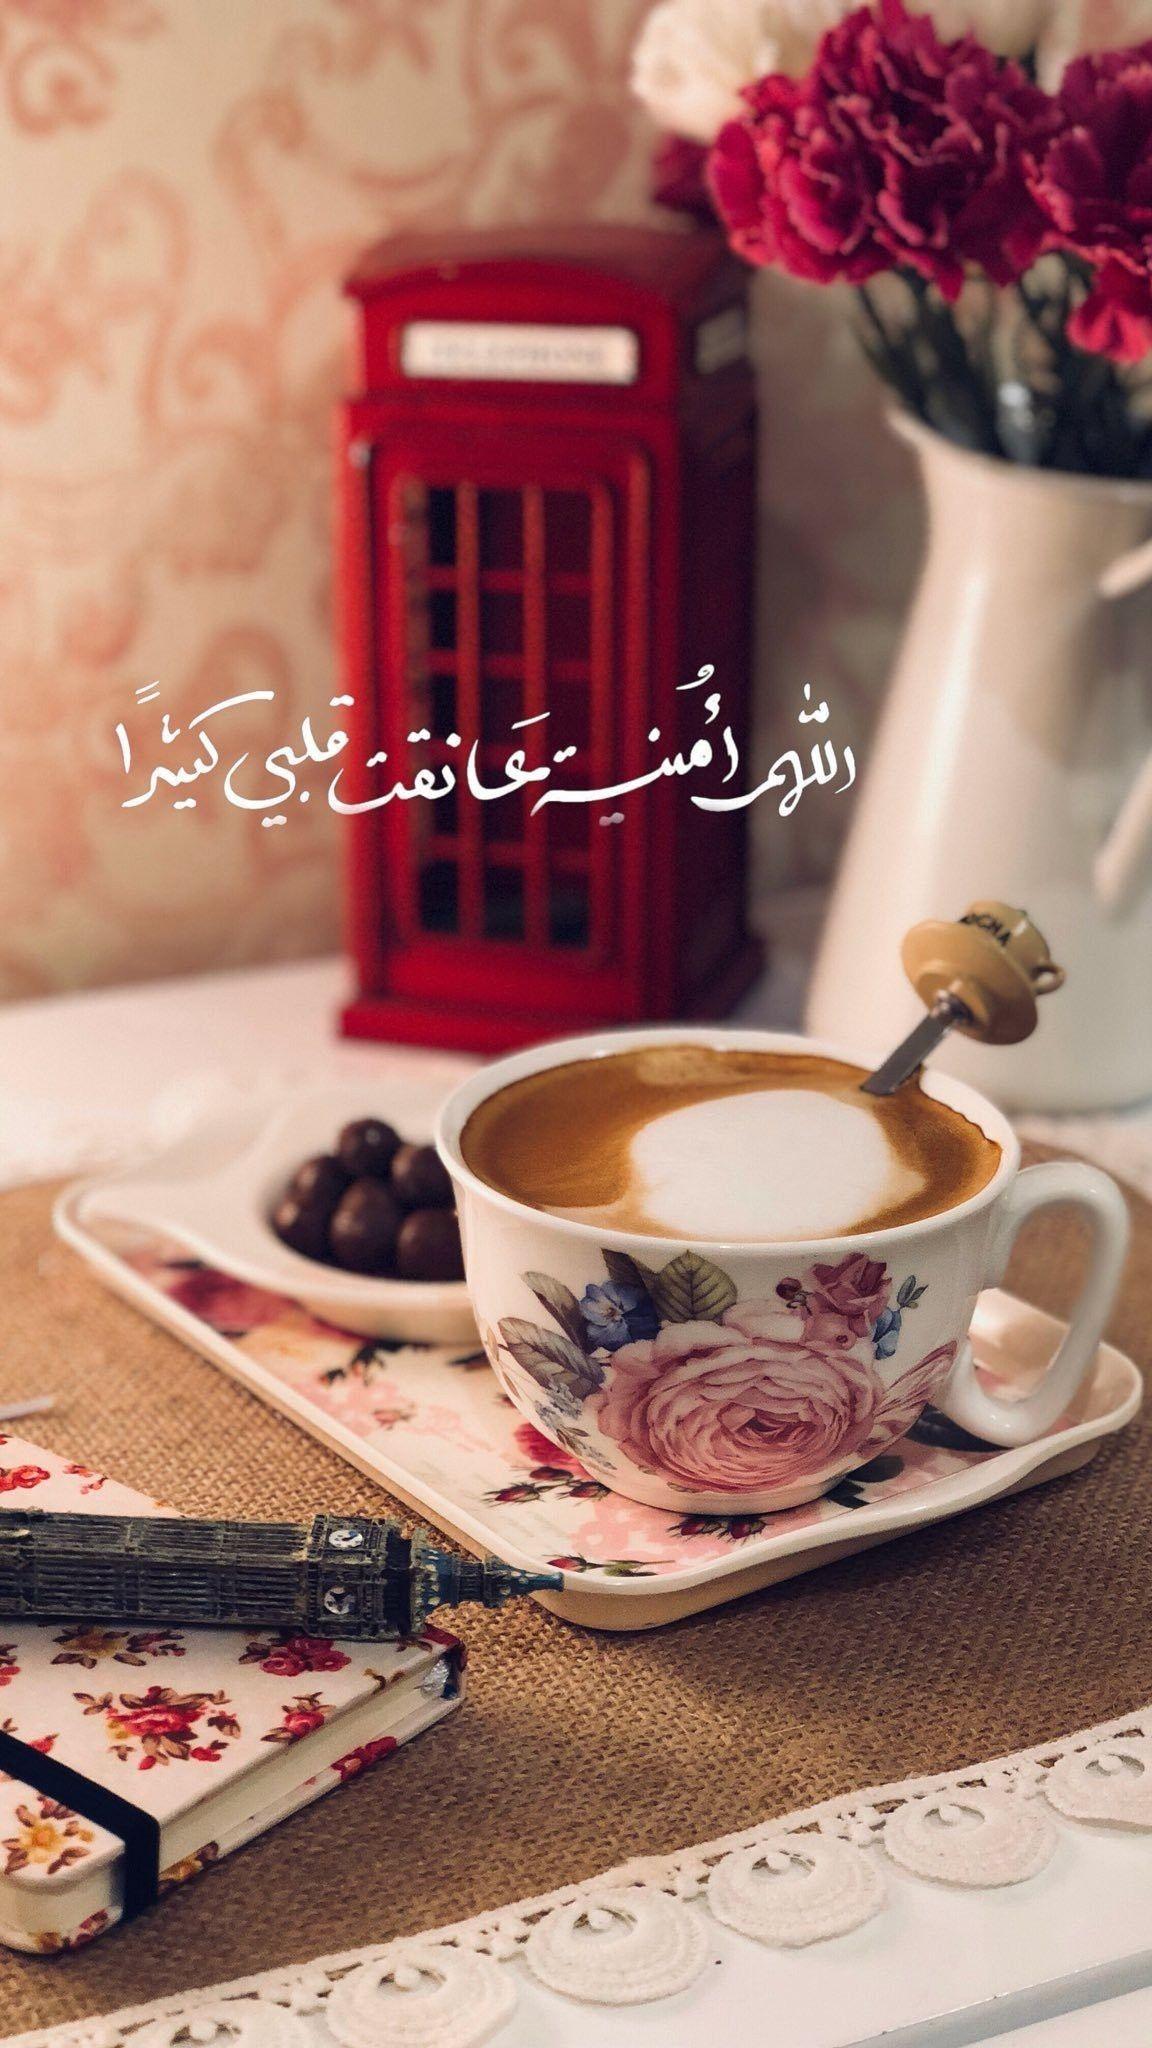 6 11 امين يارب Coffee Love Quotes Arabic Love Quotes Cover Photo Quotes